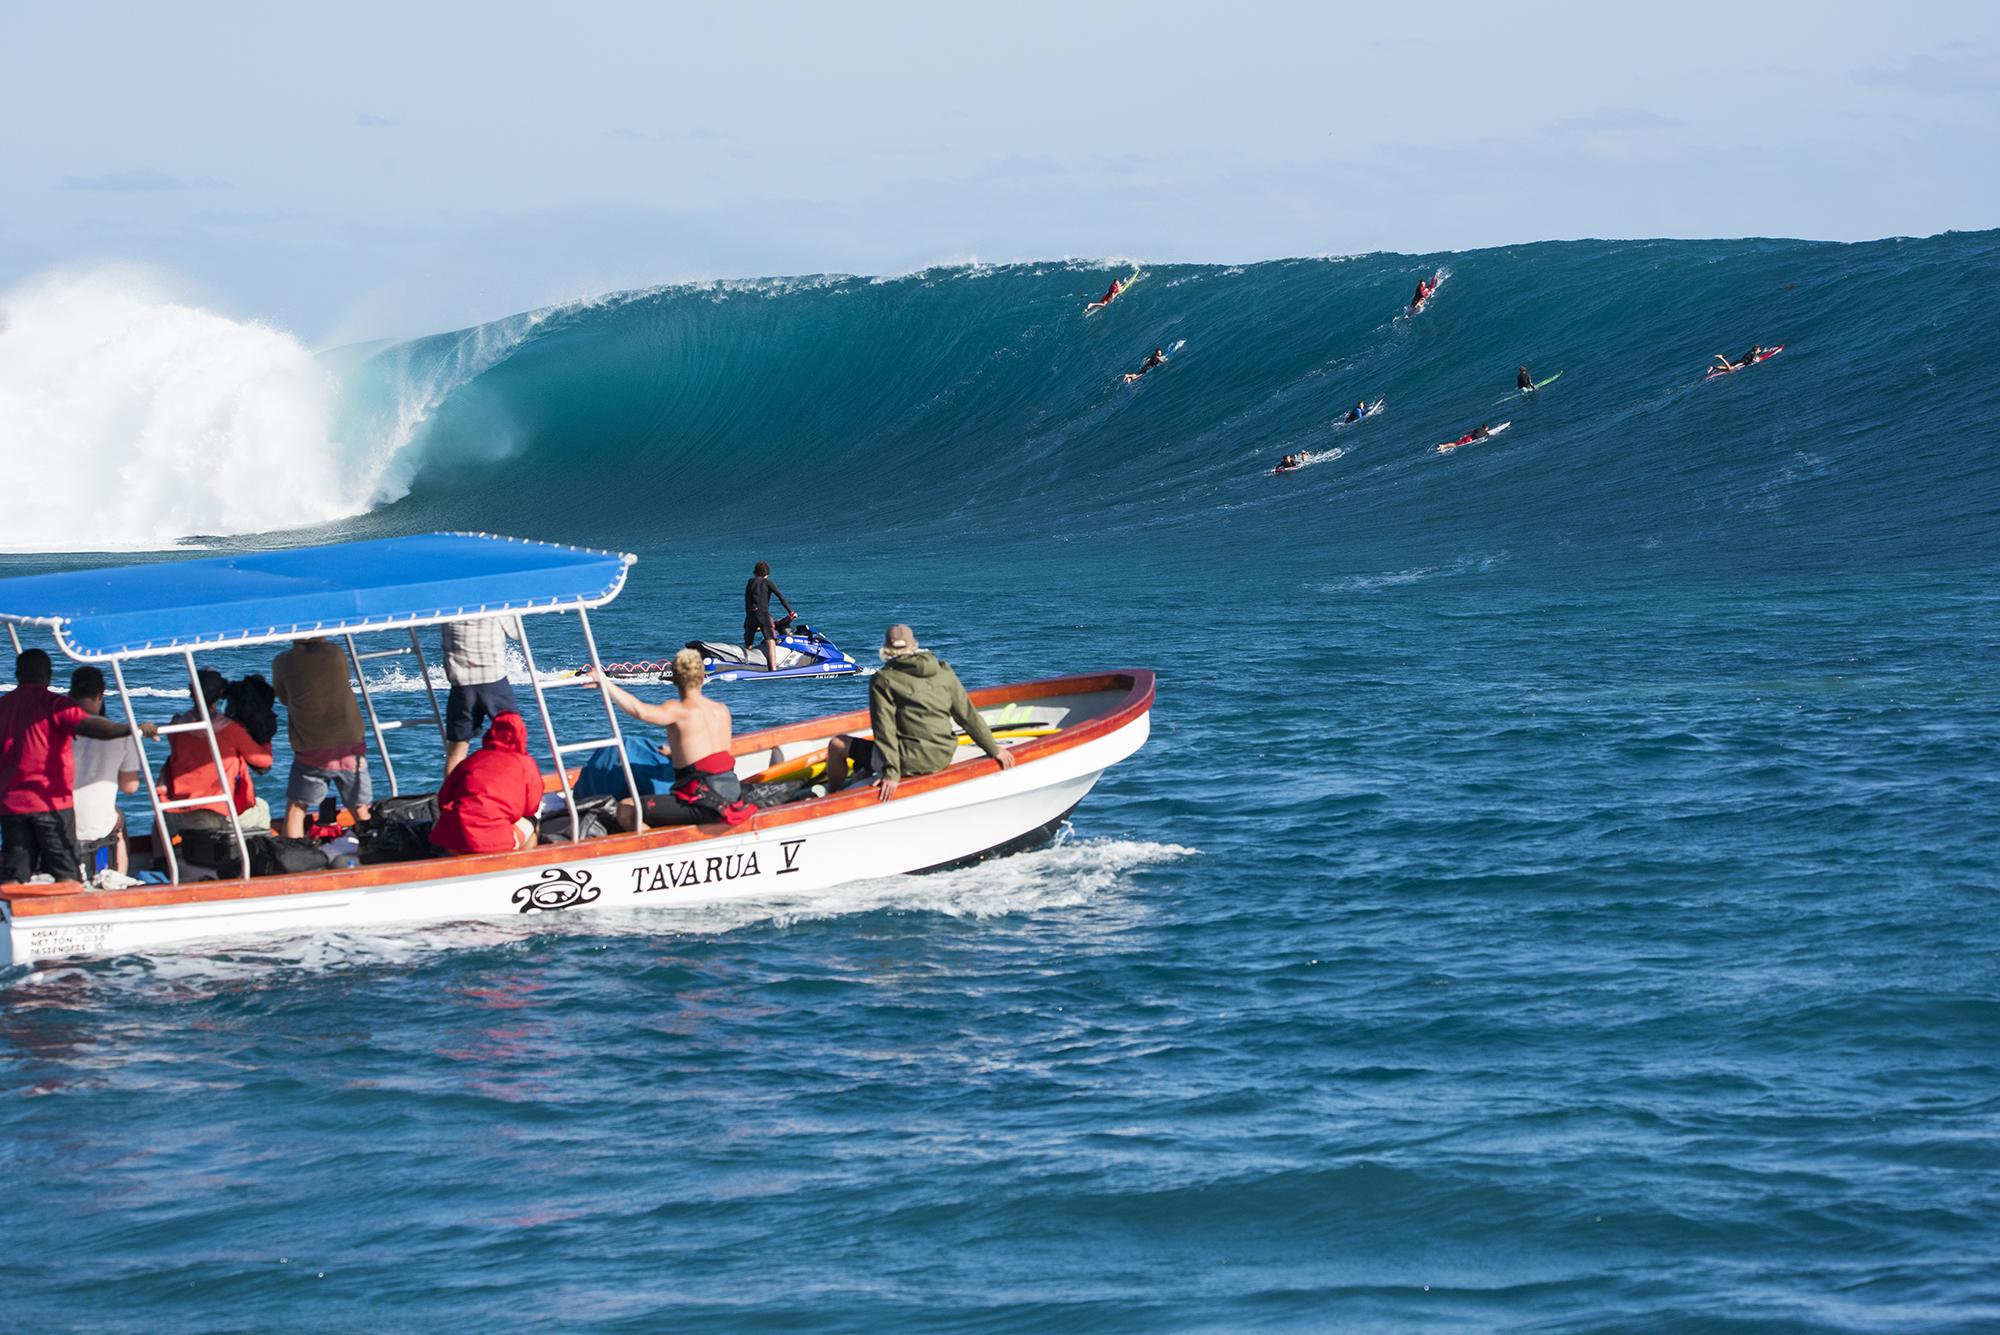 tavarua boat with bombing cloudbreak